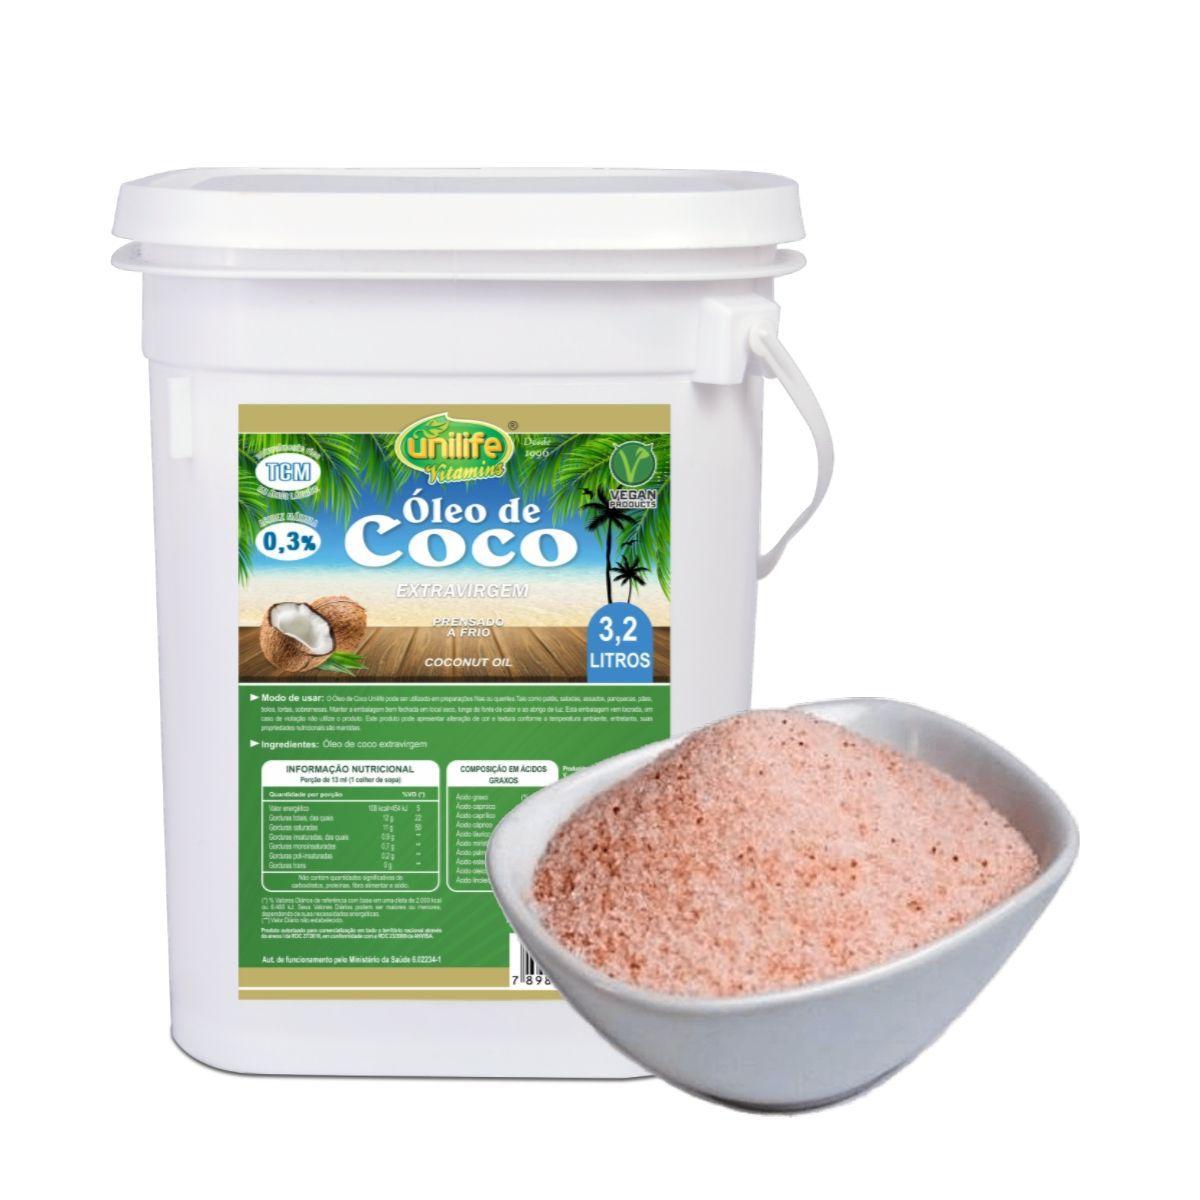 Kit Oleo De Coco Extra Virgem 3,2 L + Sal Rosa Do Himalaia 1 Kg